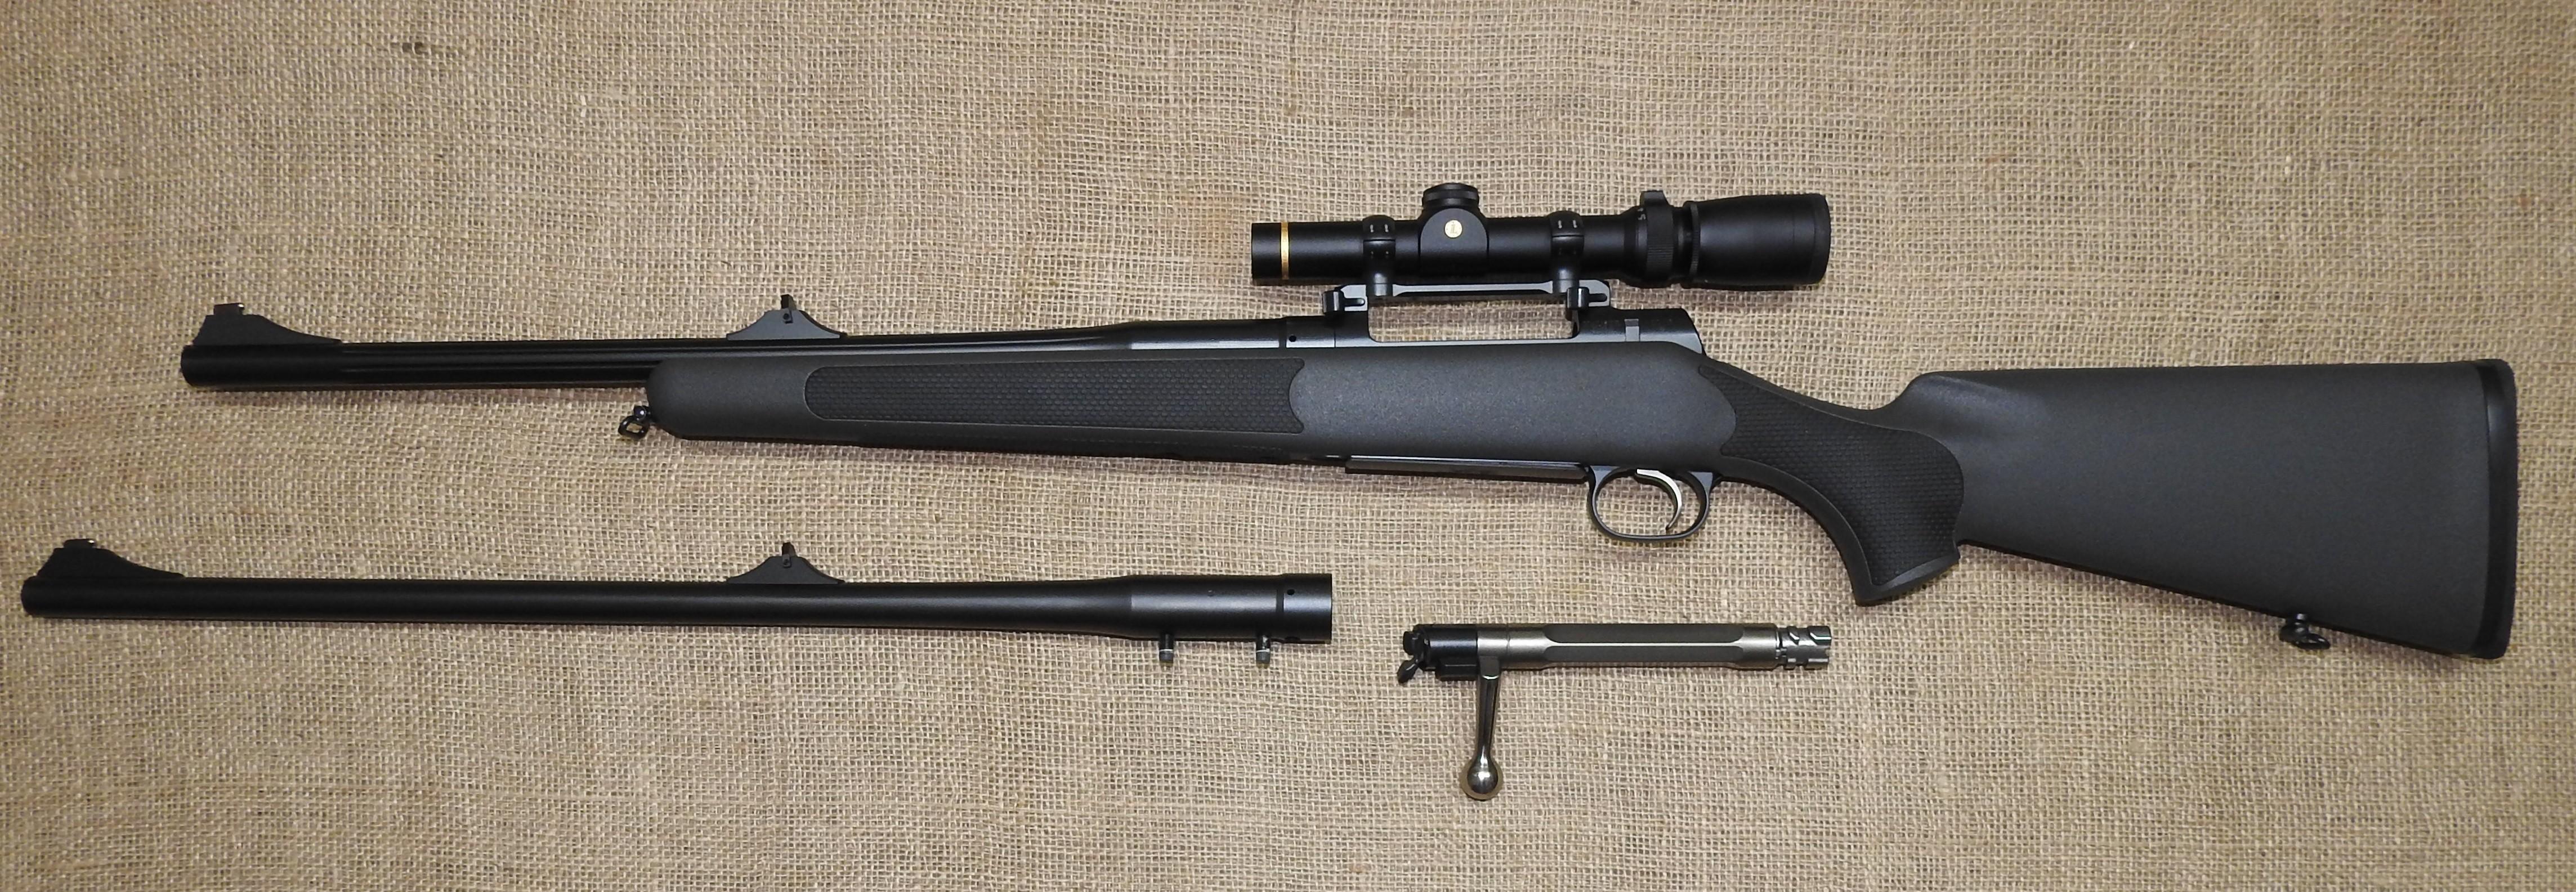 Mauser MO3 | Guns & Tackle